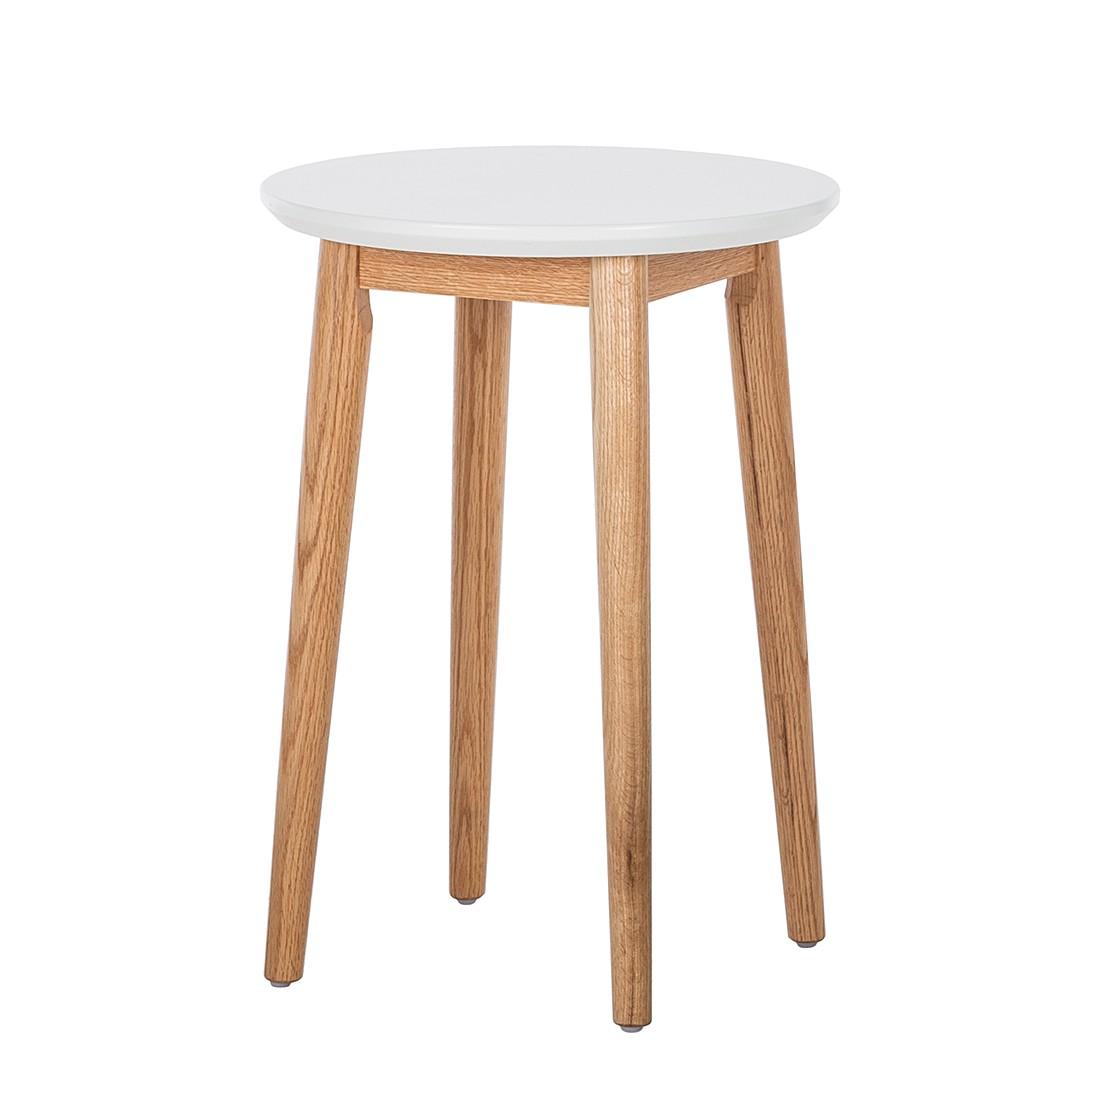 Table d'appoint Lindholm